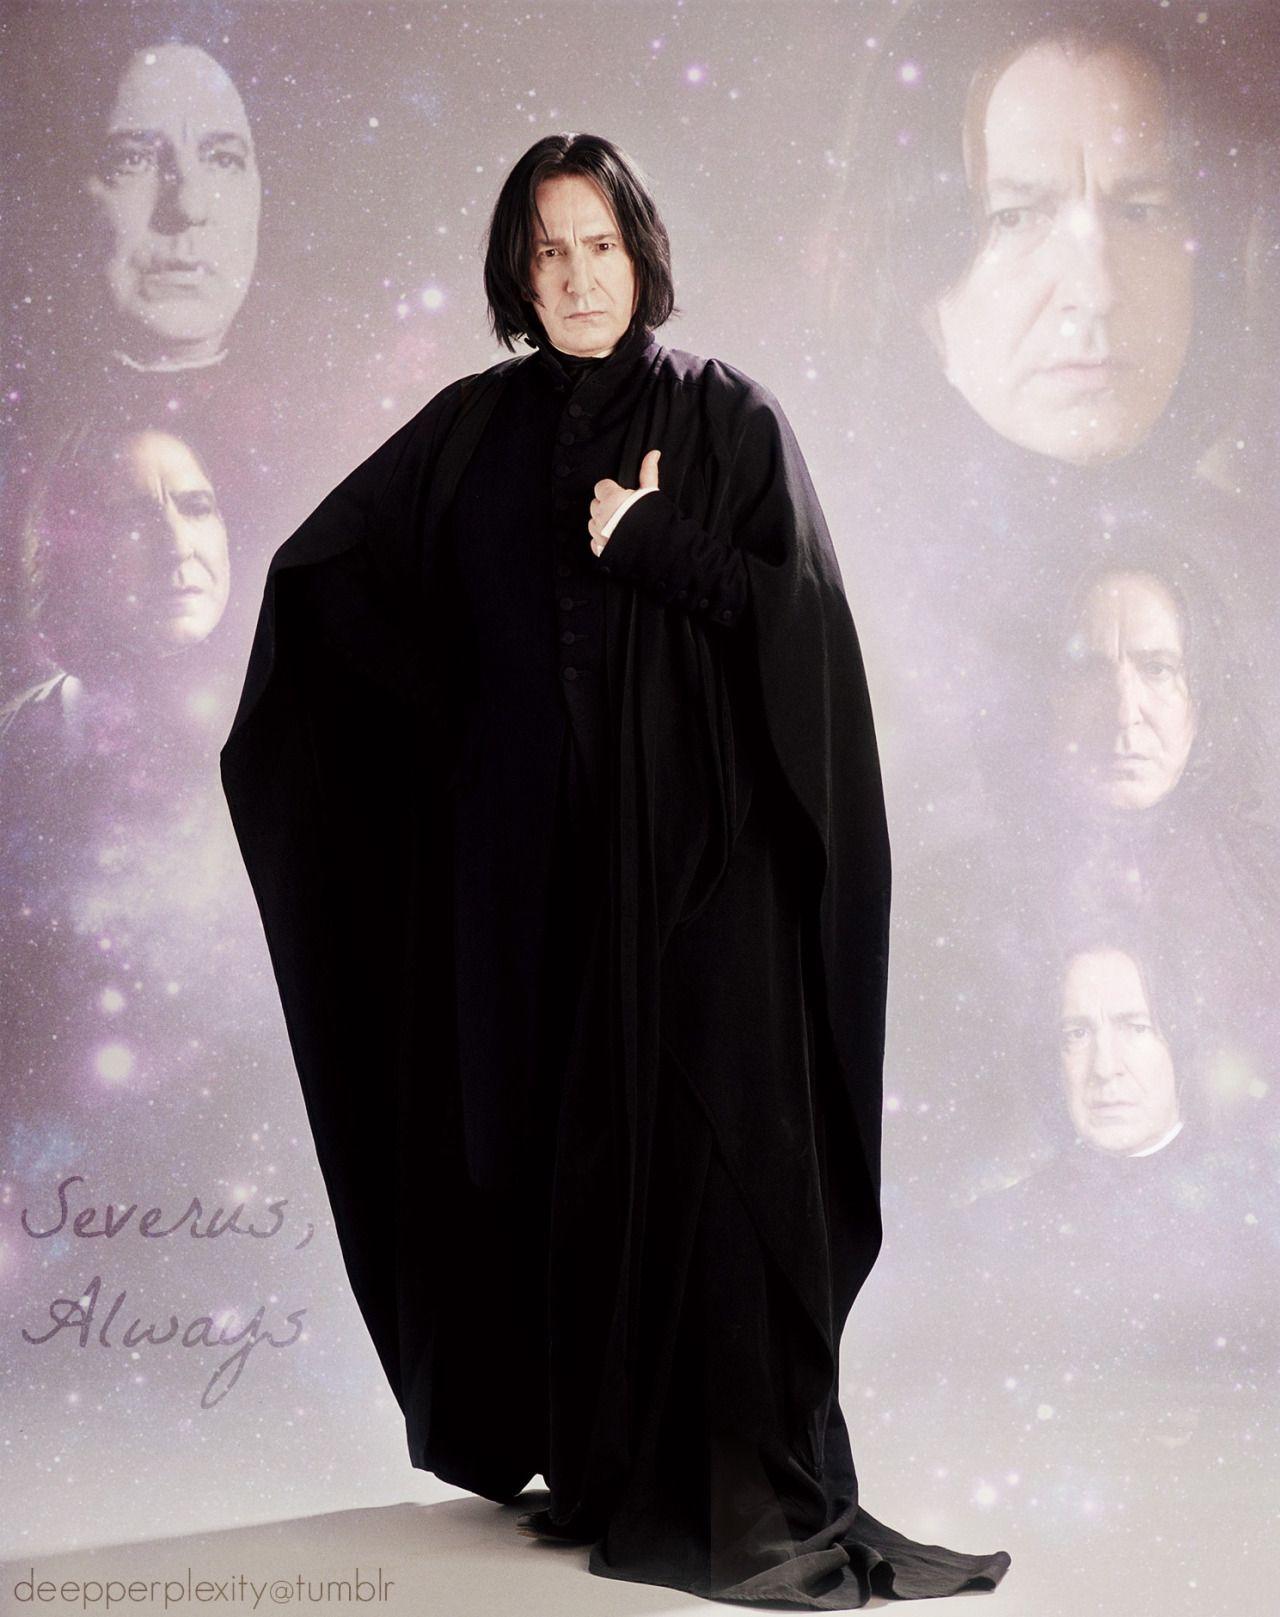 Deepperplexity Severus Snape Harry Potter Professoren Alan Rickman Severus Snape